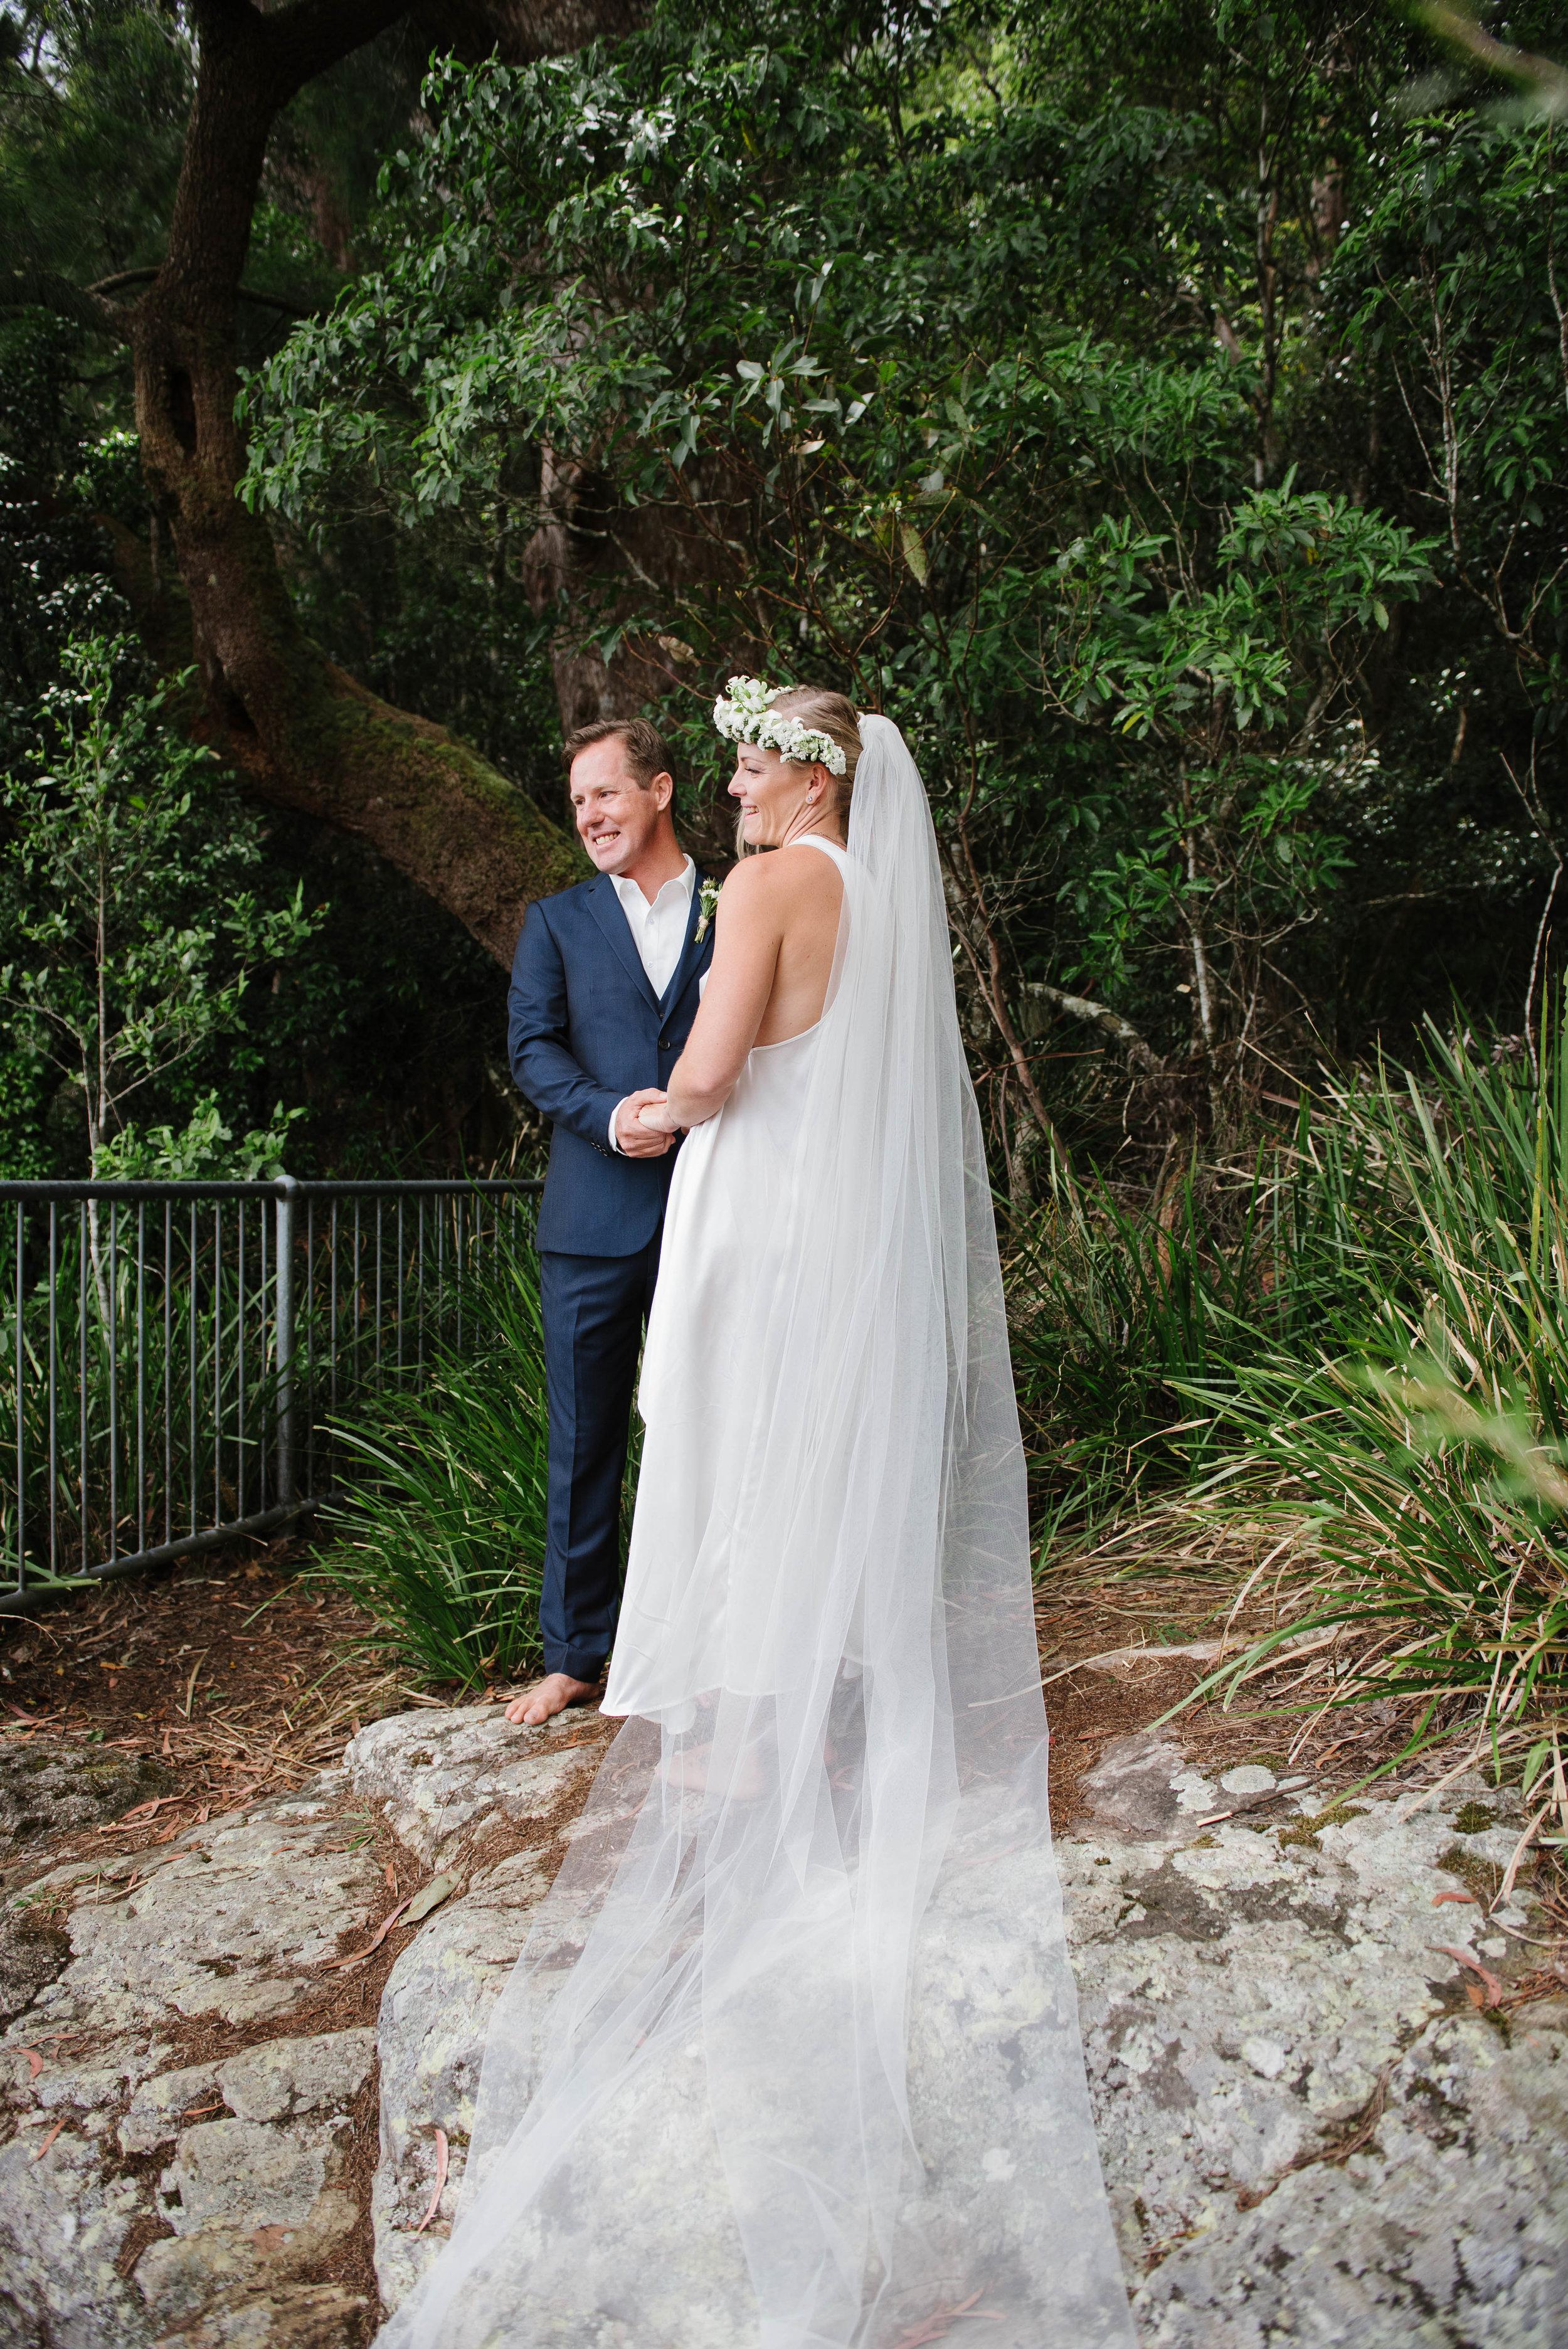 Carla and Luke- wedding photographer, byron bay wedding and family photographer, tweed heads wedding and family photography-170.jpg